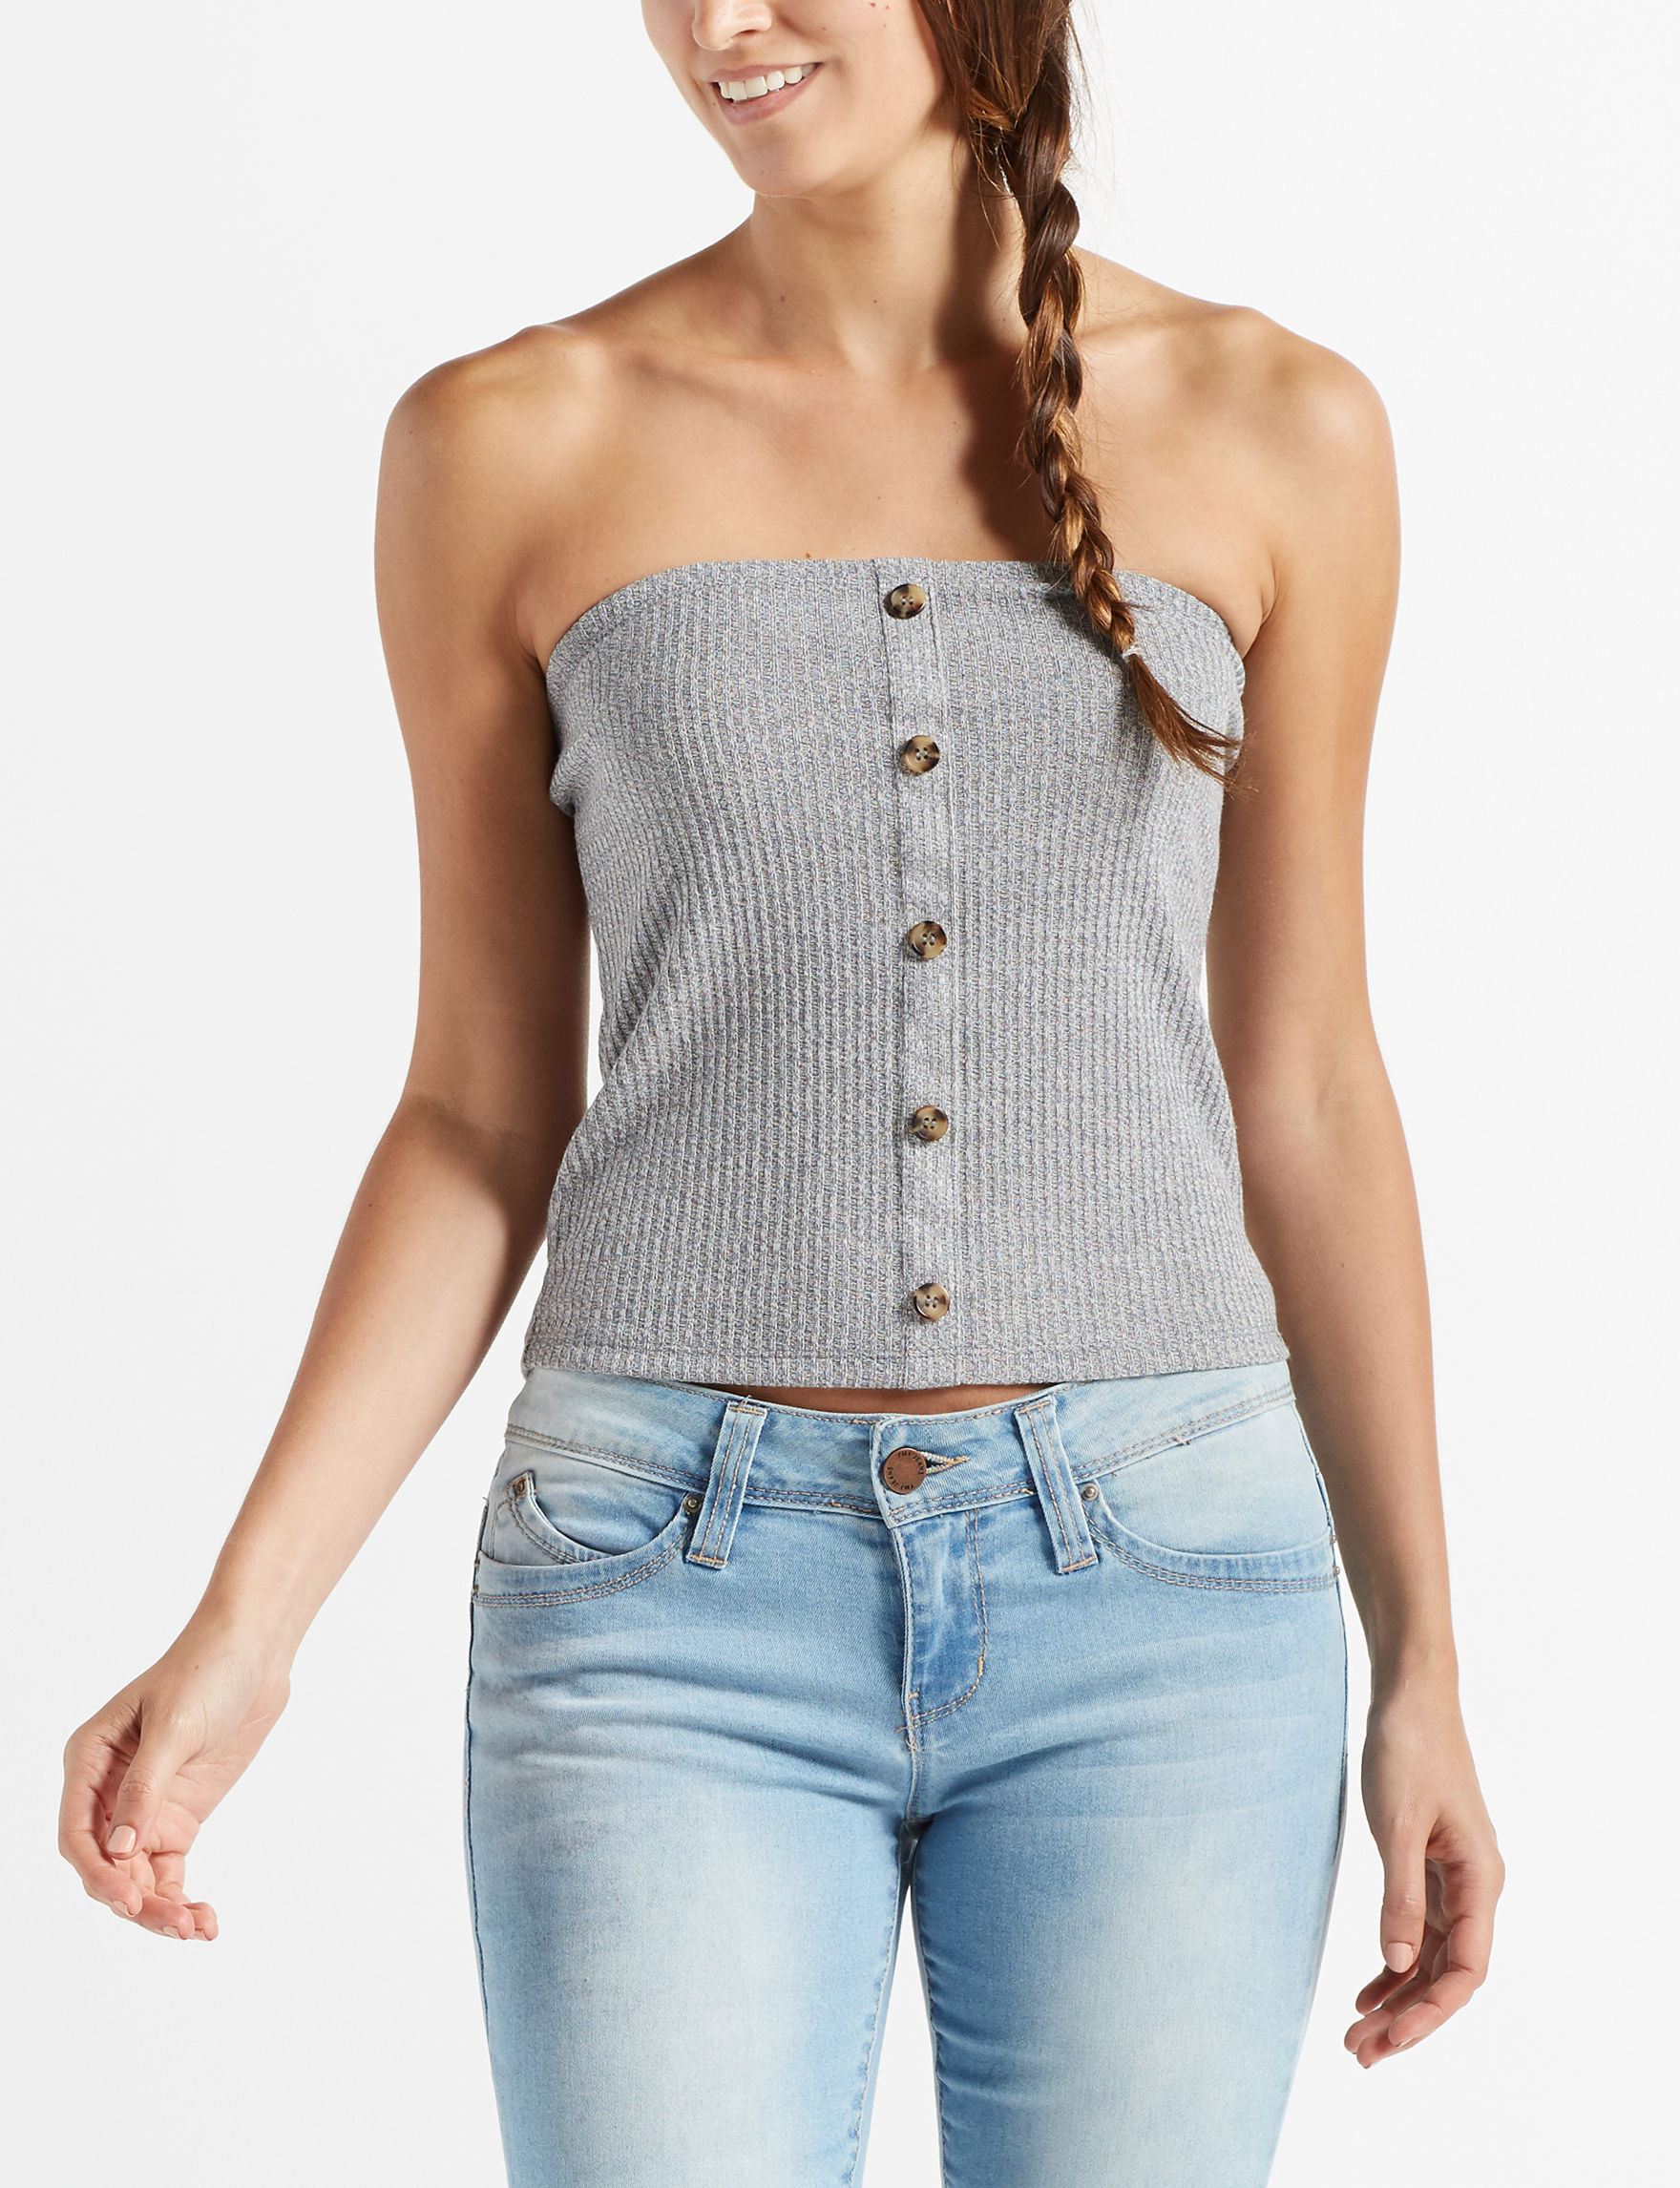 Wishful Park Heather Grey Shirts & Blouses